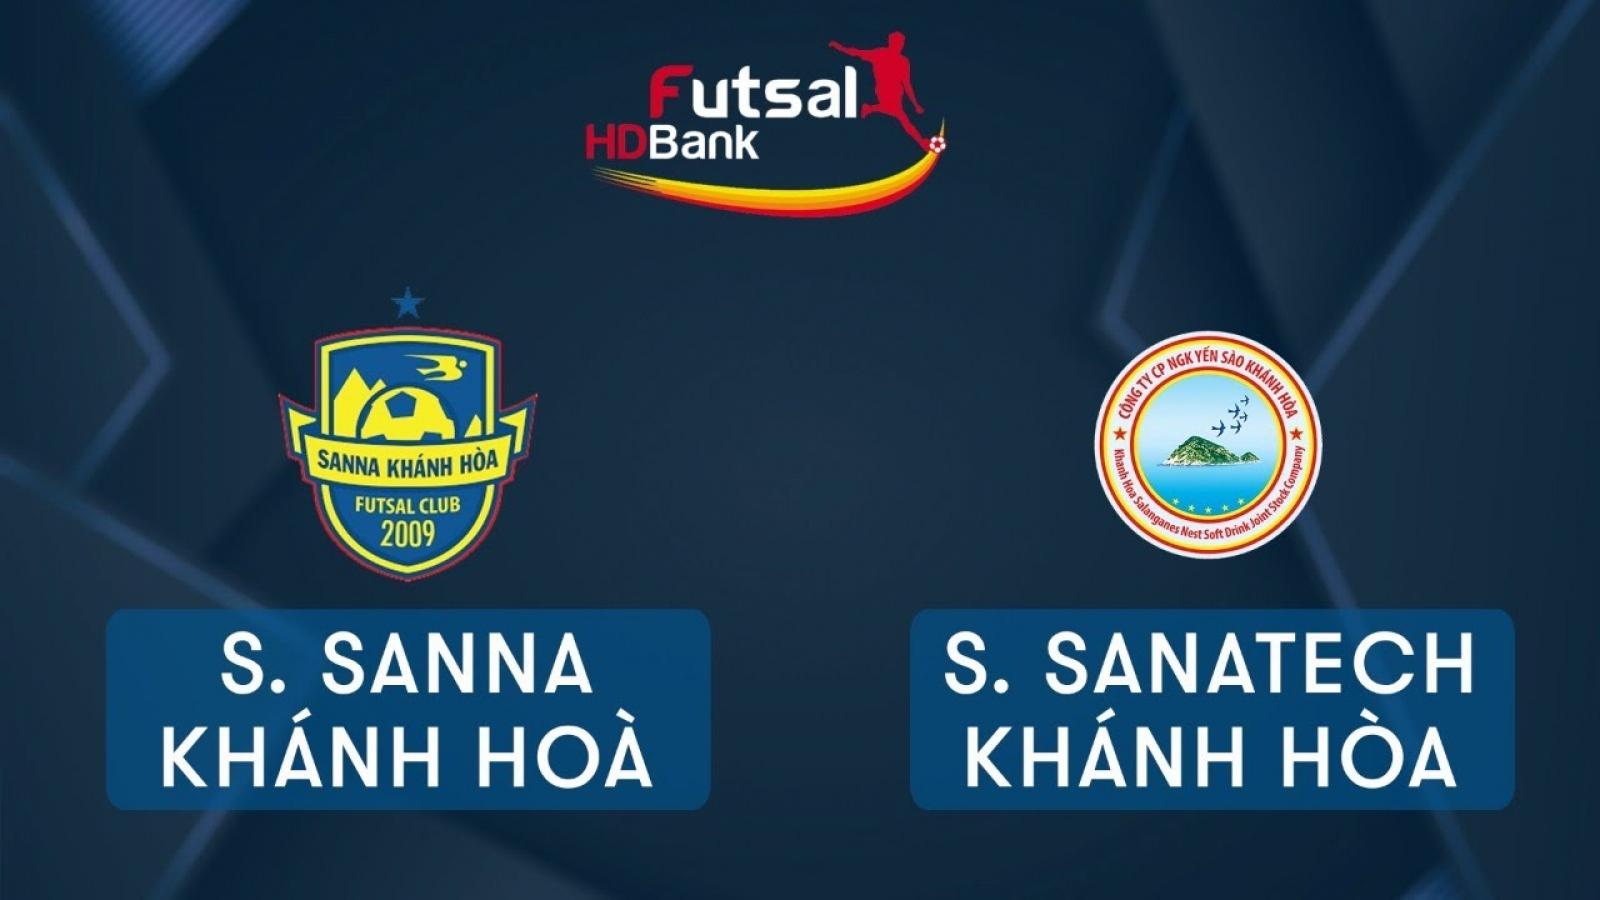 Trực tiếp Savinest Sanna Khánh Hòa vs Savinest Sanatech Khánh Hòa Giải Futsal HDBank 2020